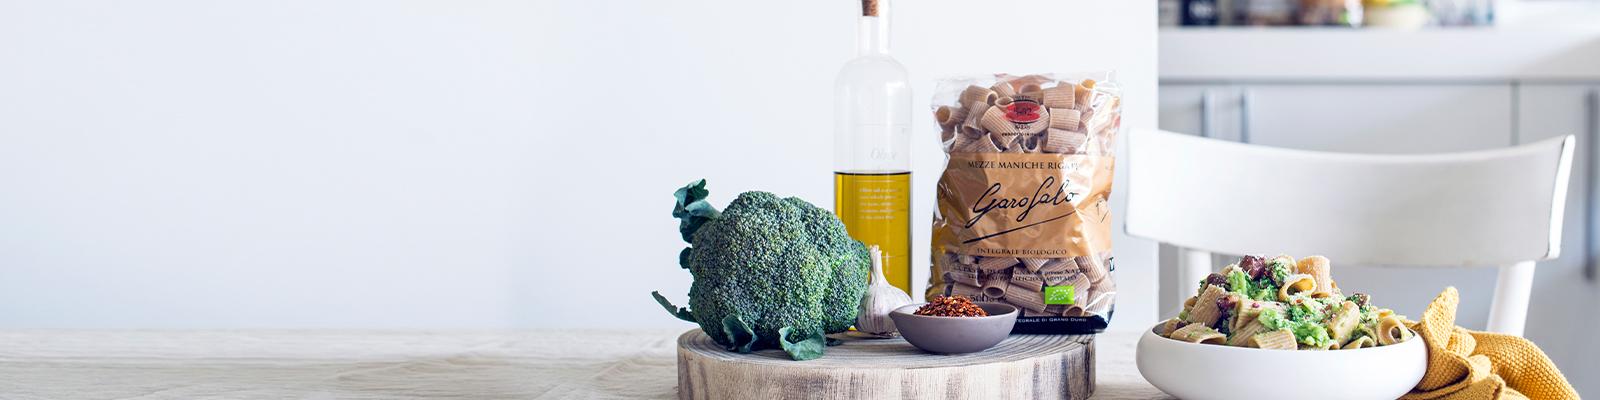 Pasta Garofalo - Organic Whole Durum Wheat Semolina